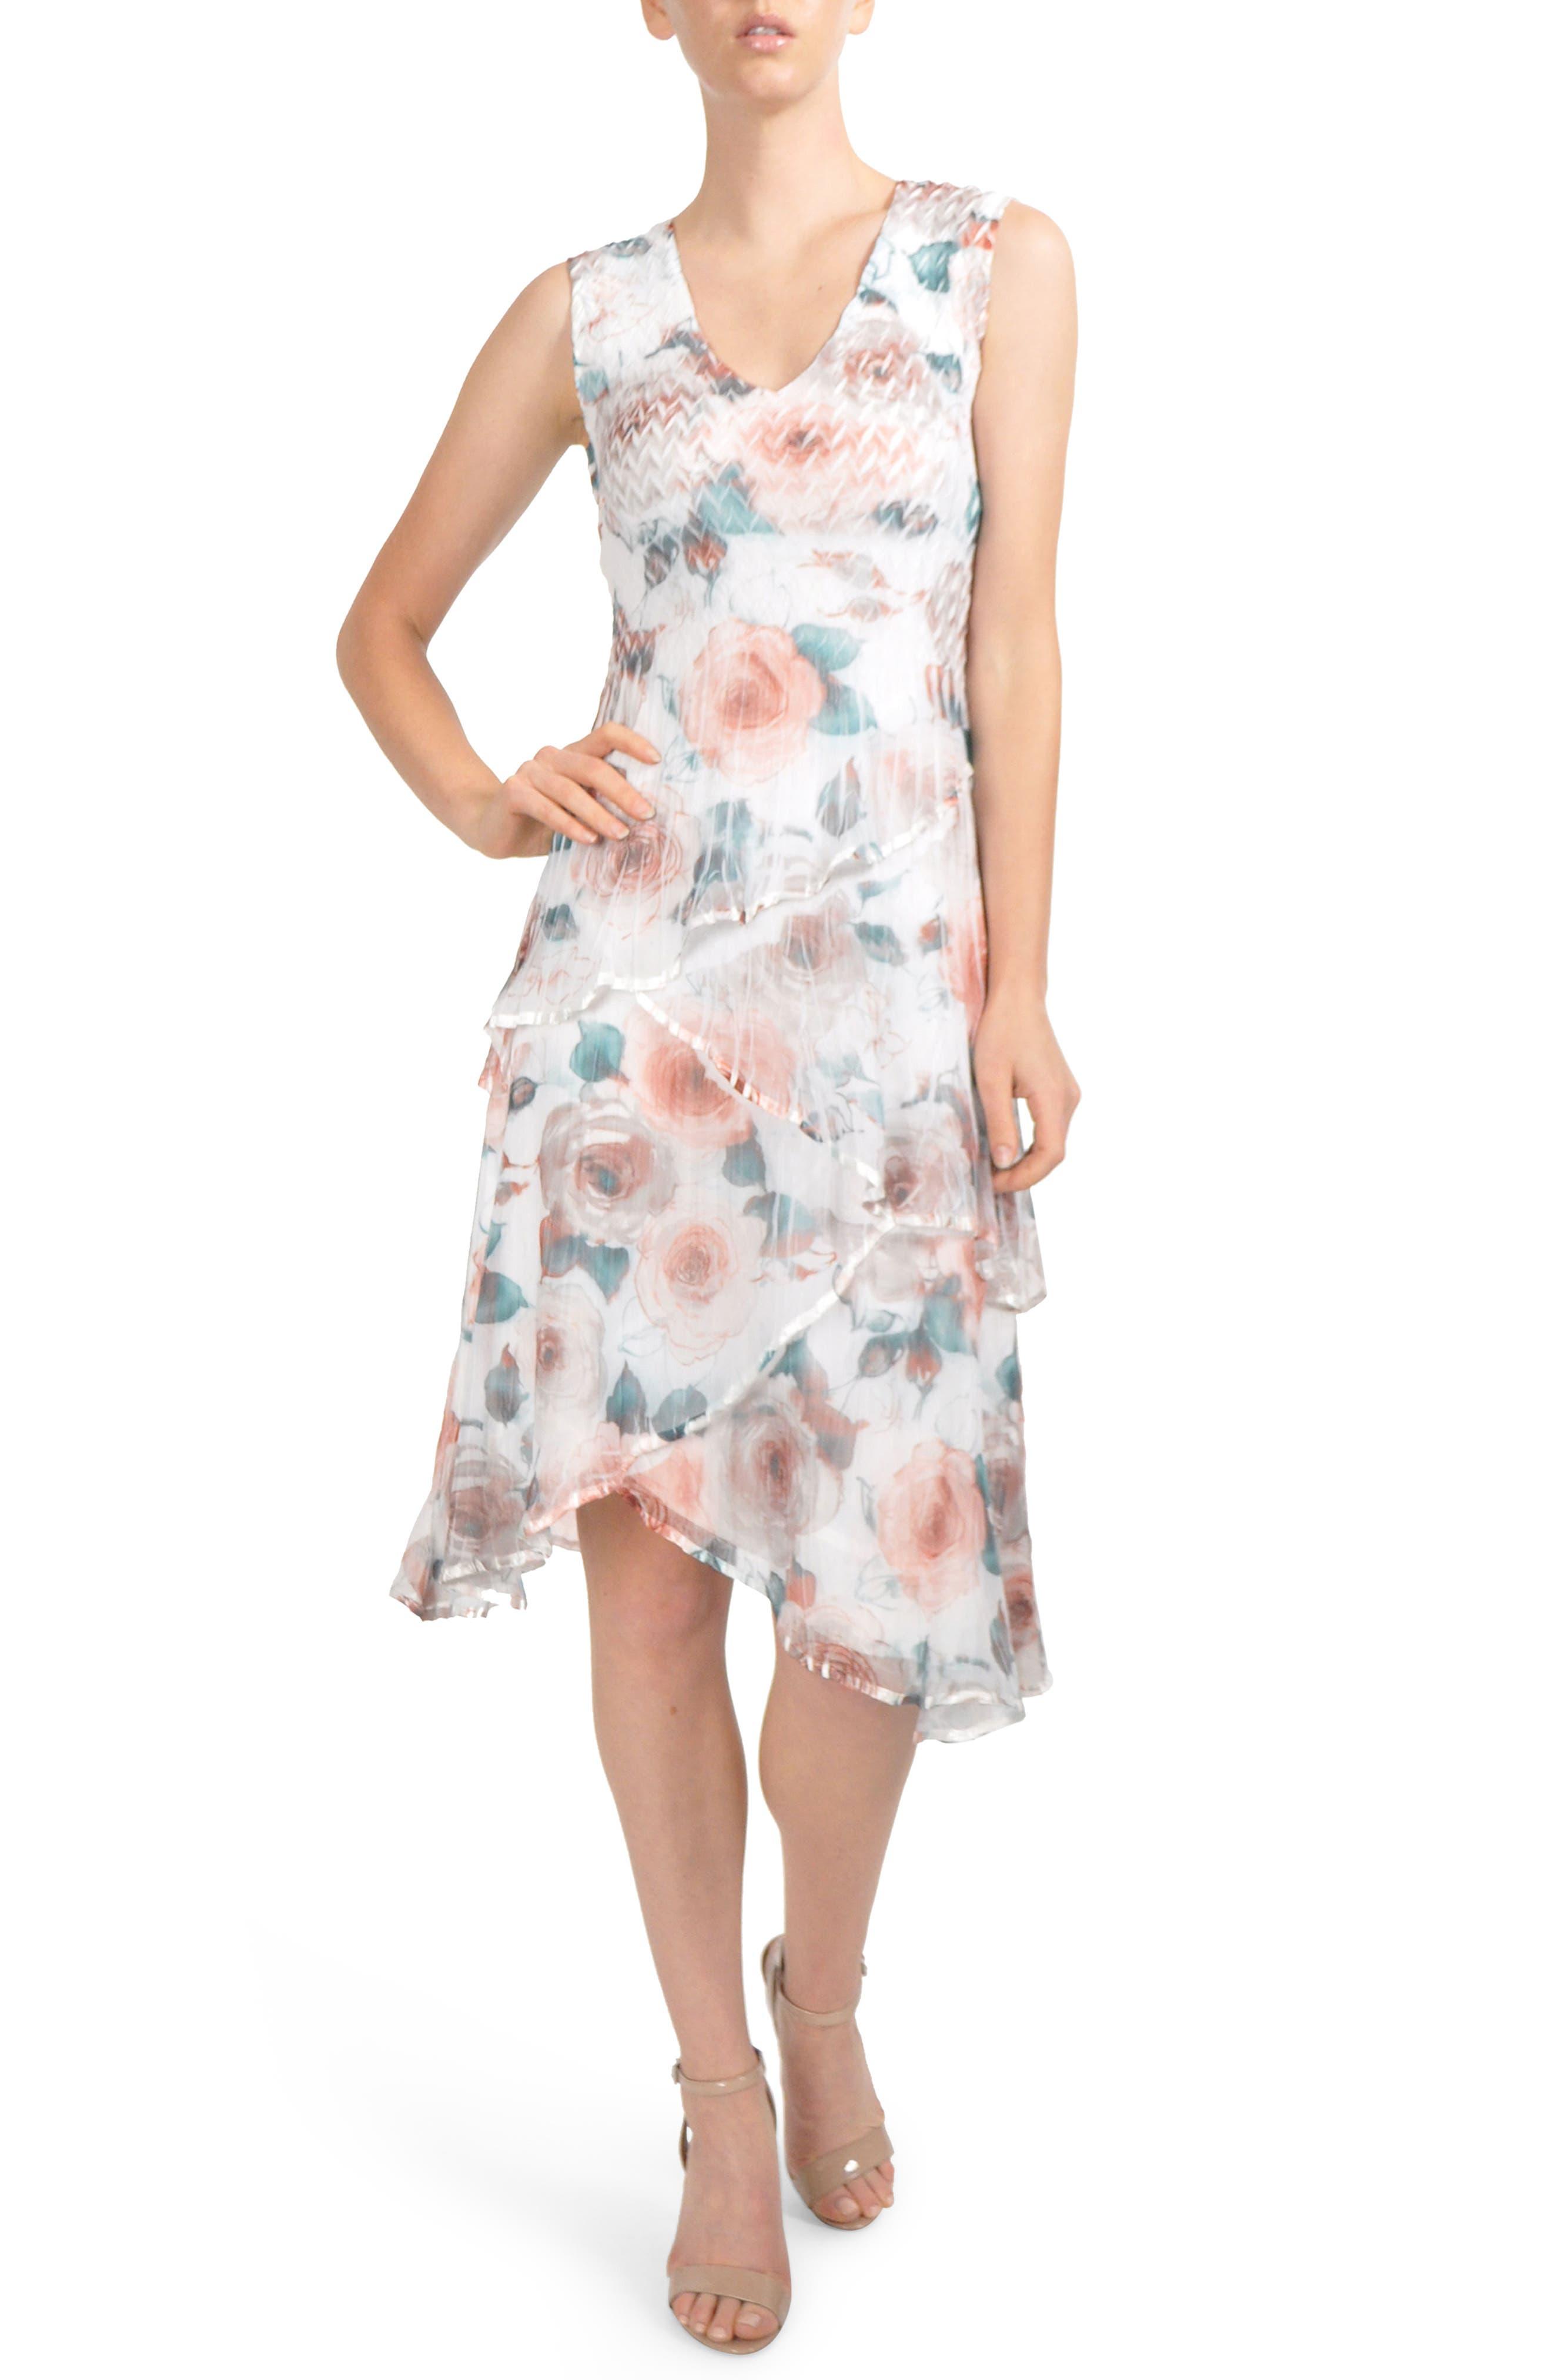 3-Tier Chiffon Knee Length Dress